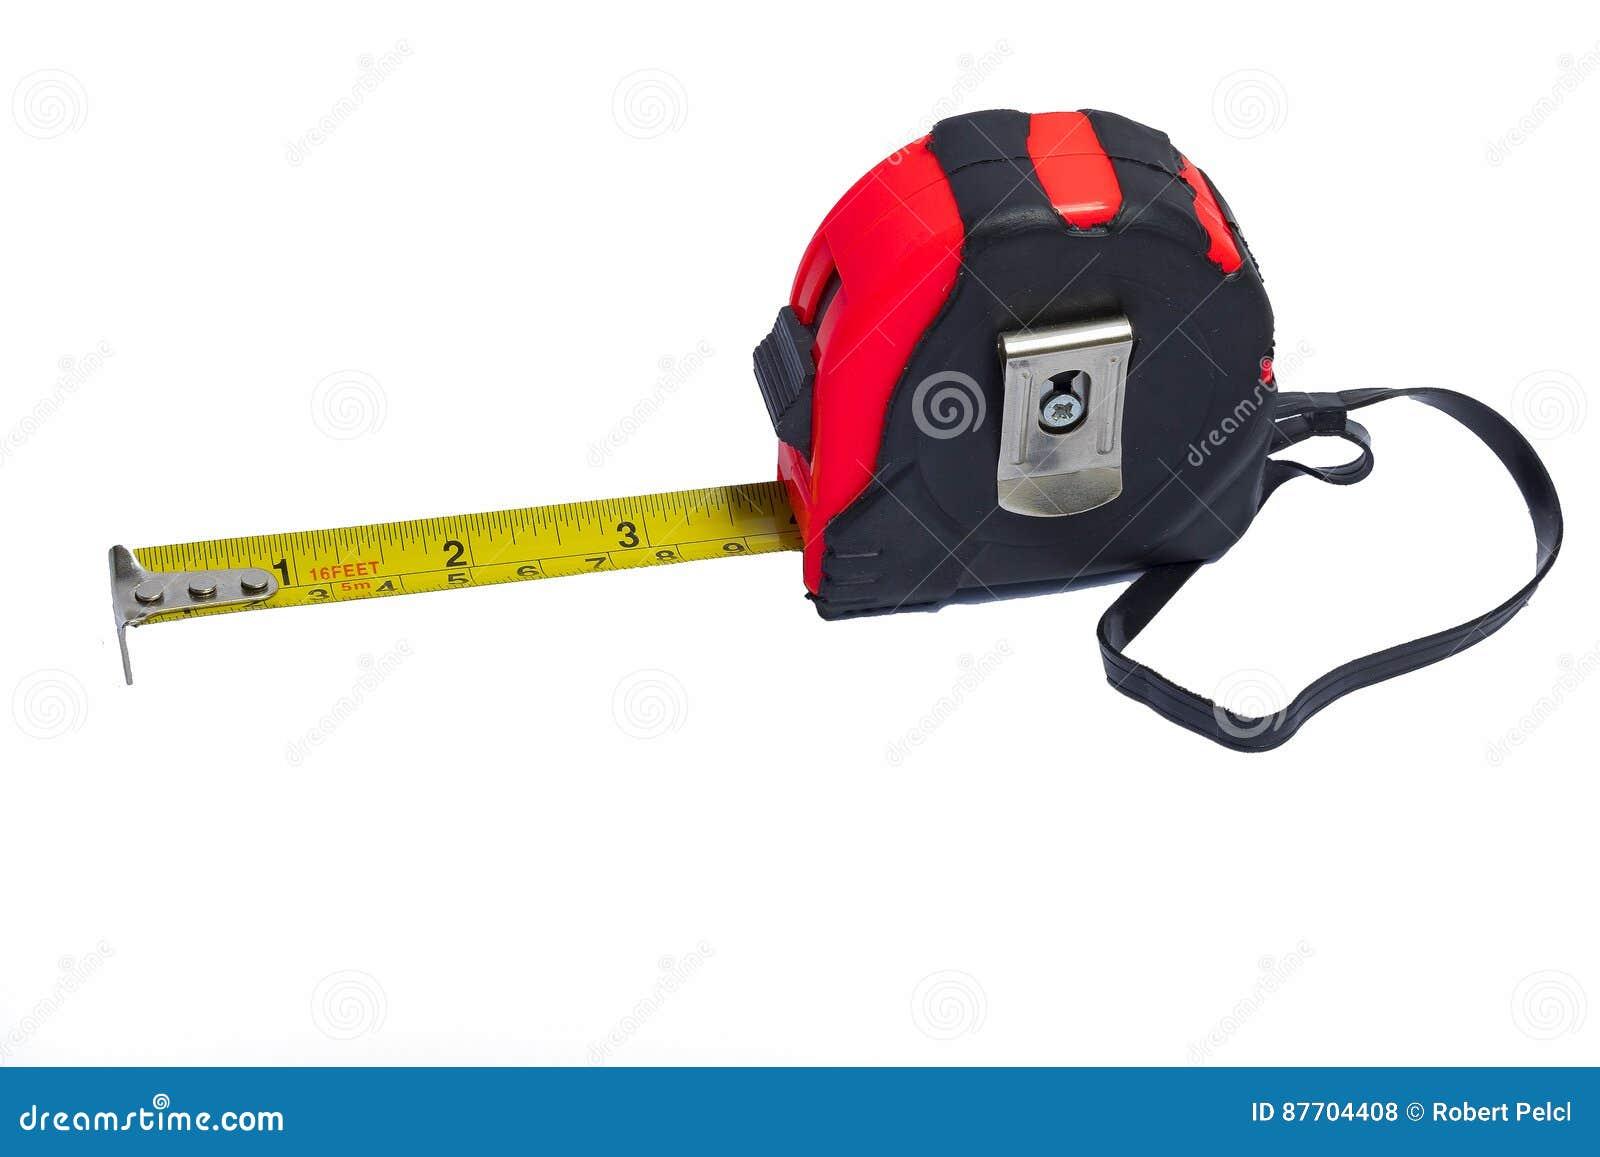 Le dispositif a destiné la bande de mesure de mesure de longueur